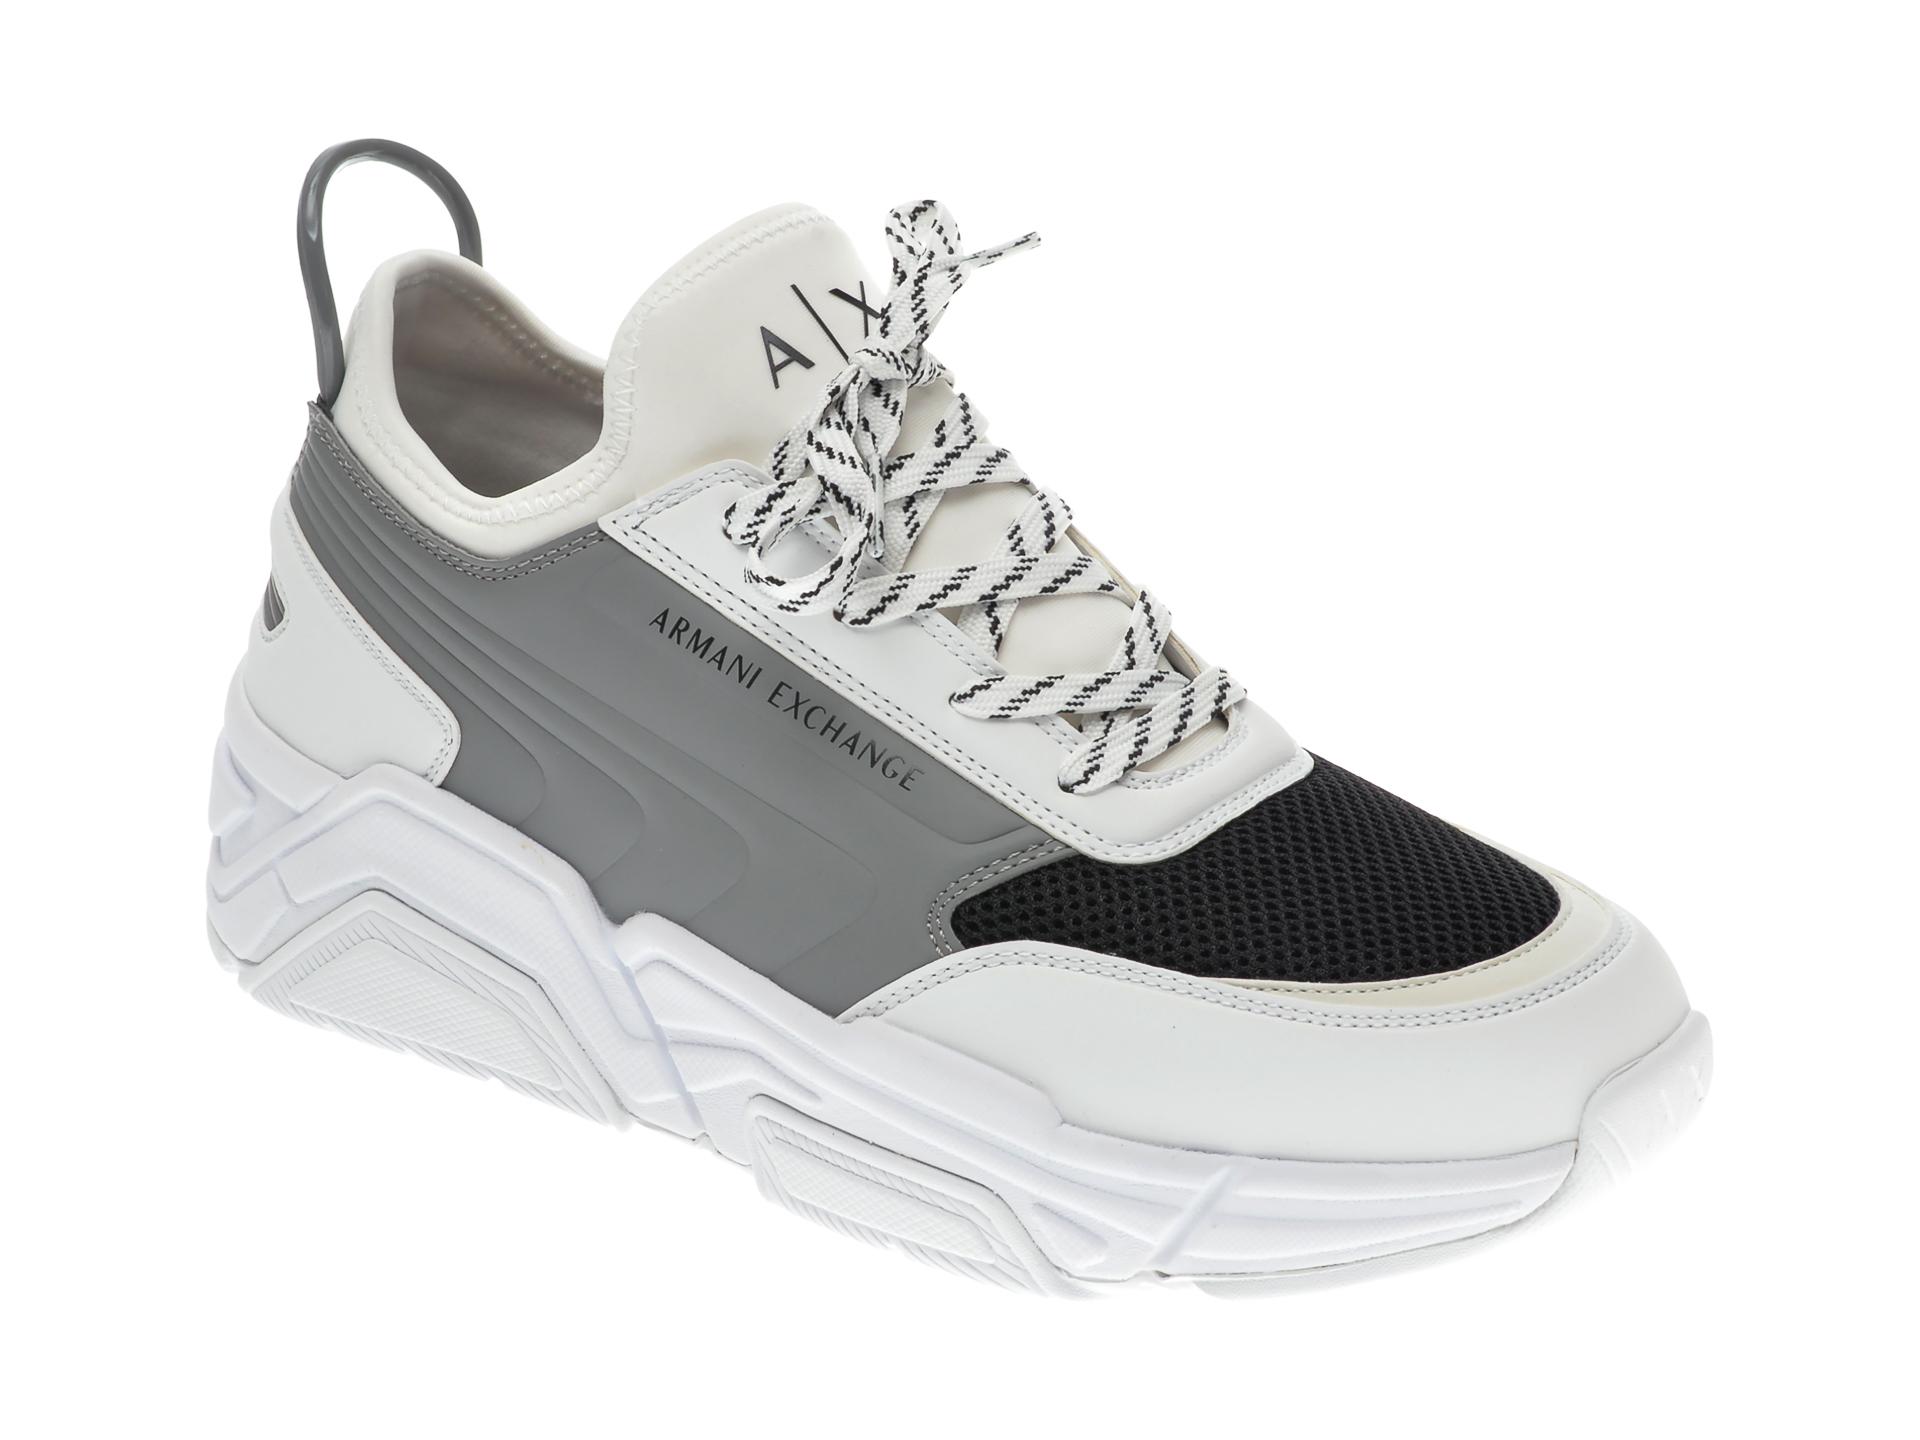 Pantofi sport ARMANI EXCHANGE albi, XUX080, din material textil si piele ecologica